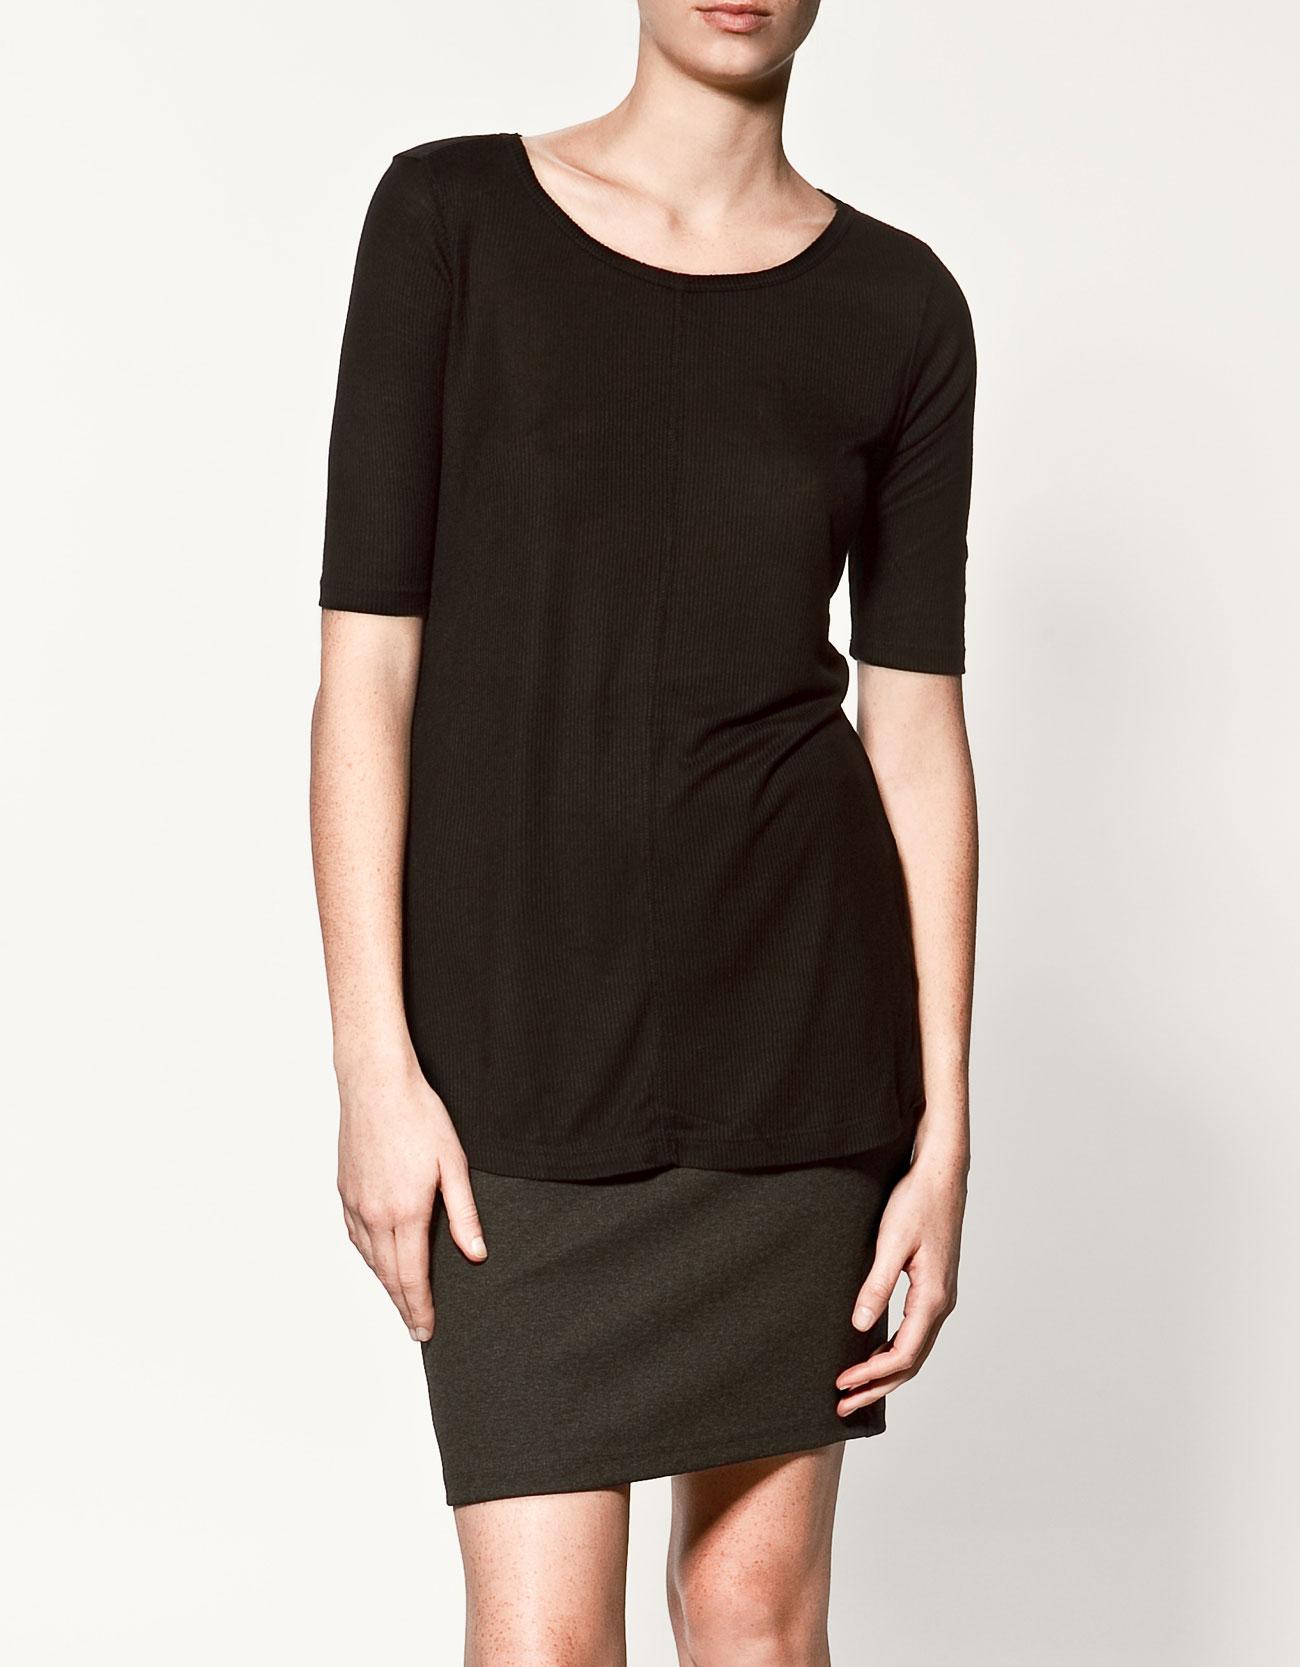 Zara basic t shirt in black lyst for Zara mens shirts sale